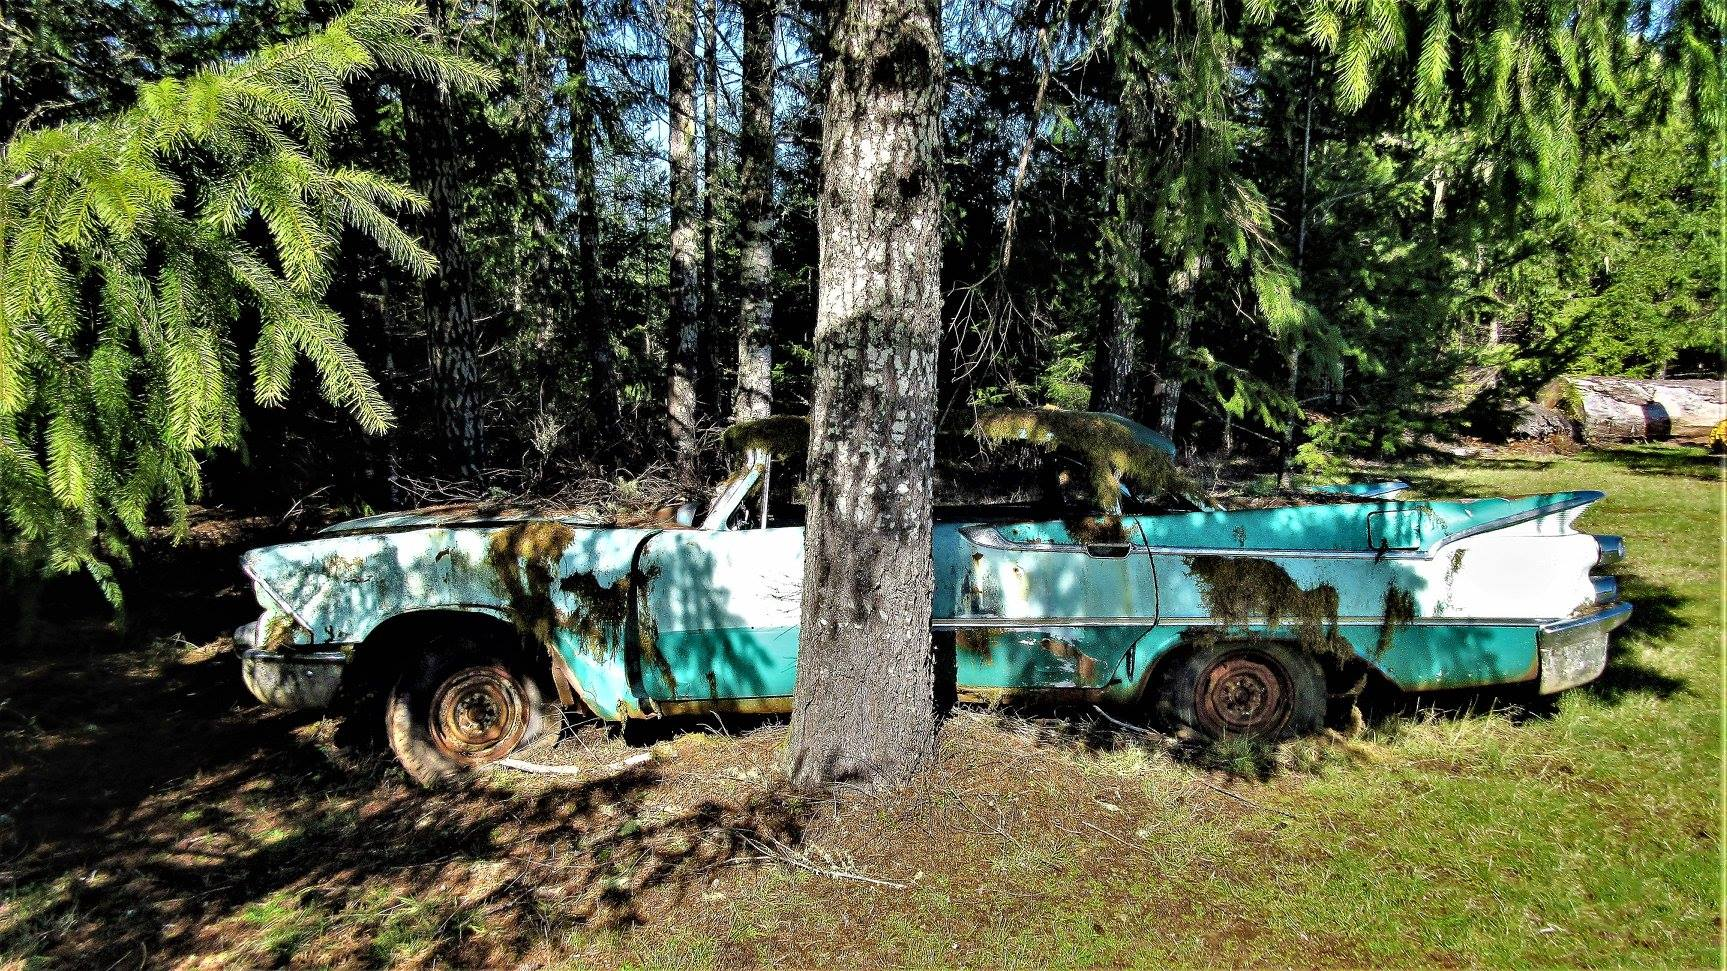 Dodge-1959-Darel-Maden-near-Carlton-Oregon-4[1]